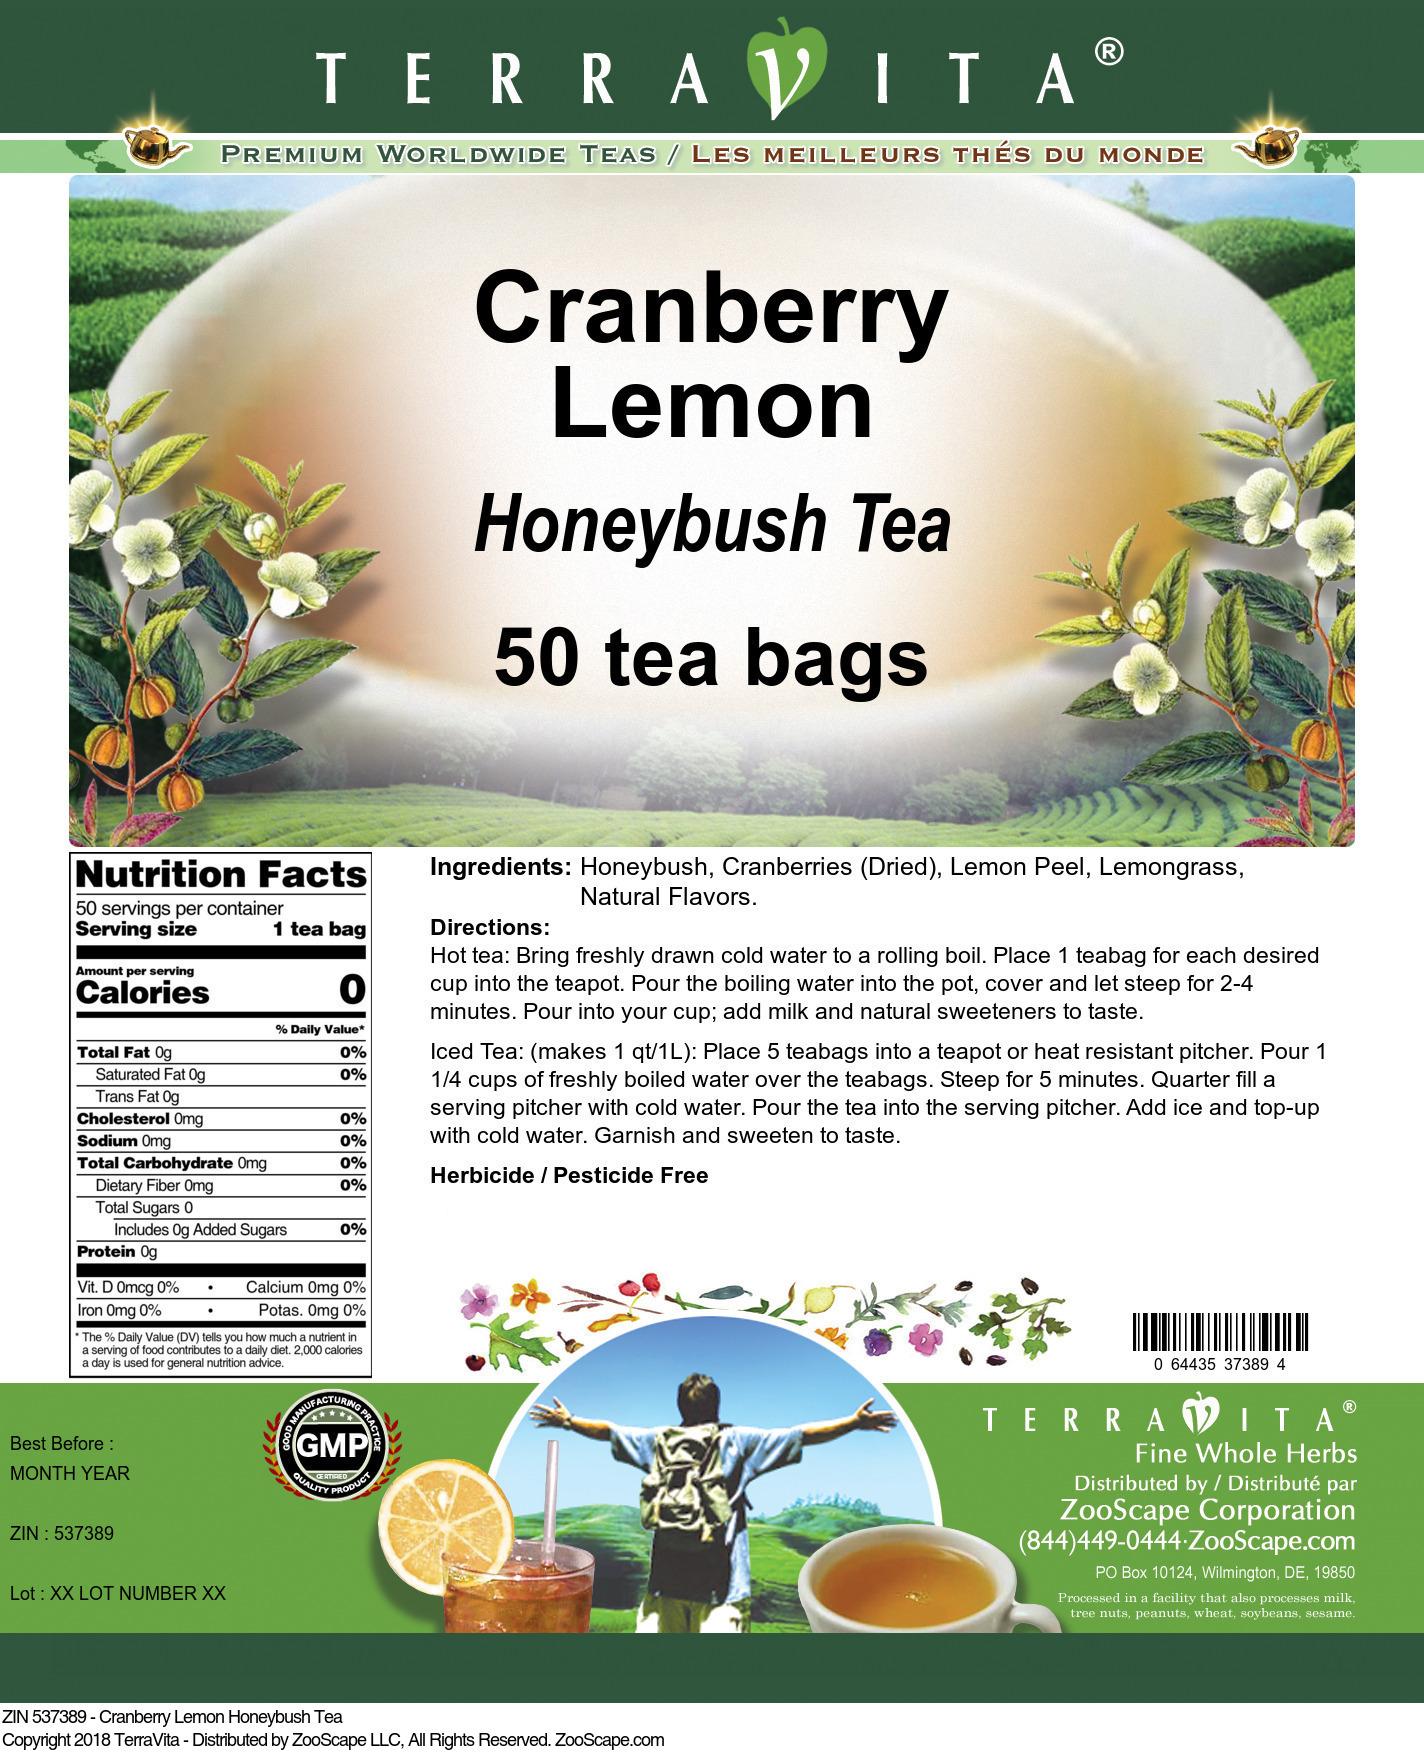 Cranberry Lemon Honeybush Tea